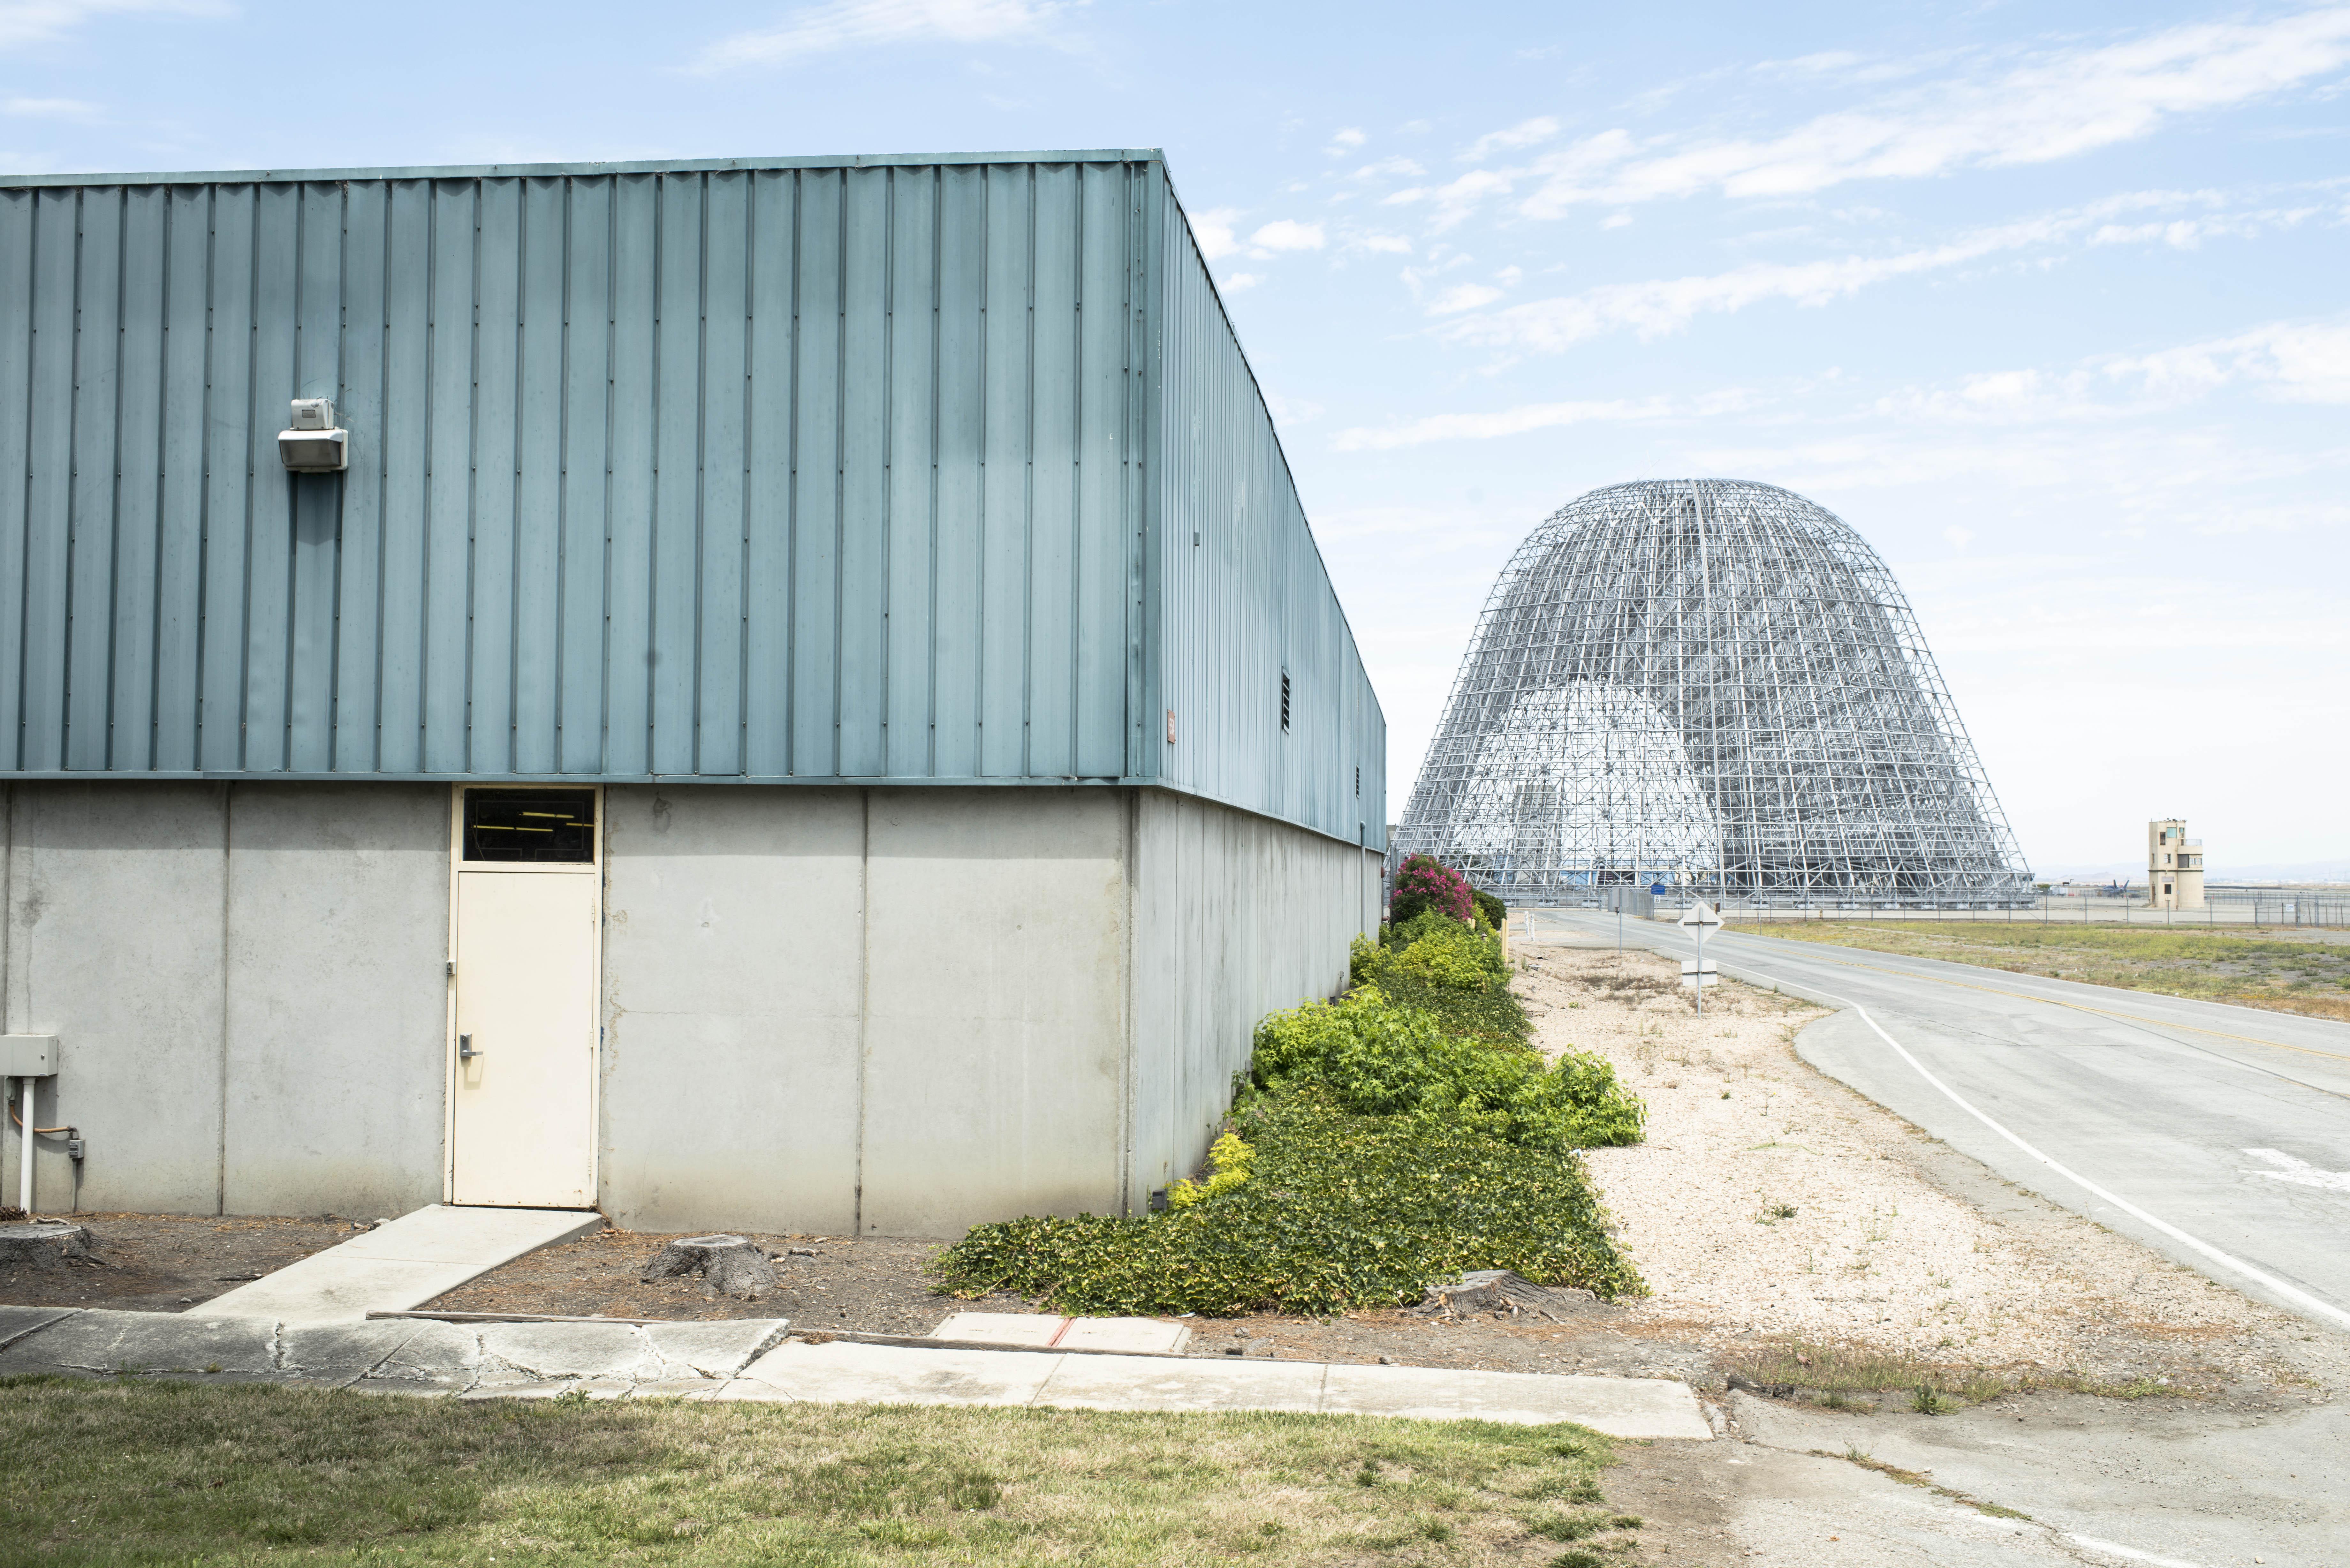 NASA Ames Buildings, Mt View, CA